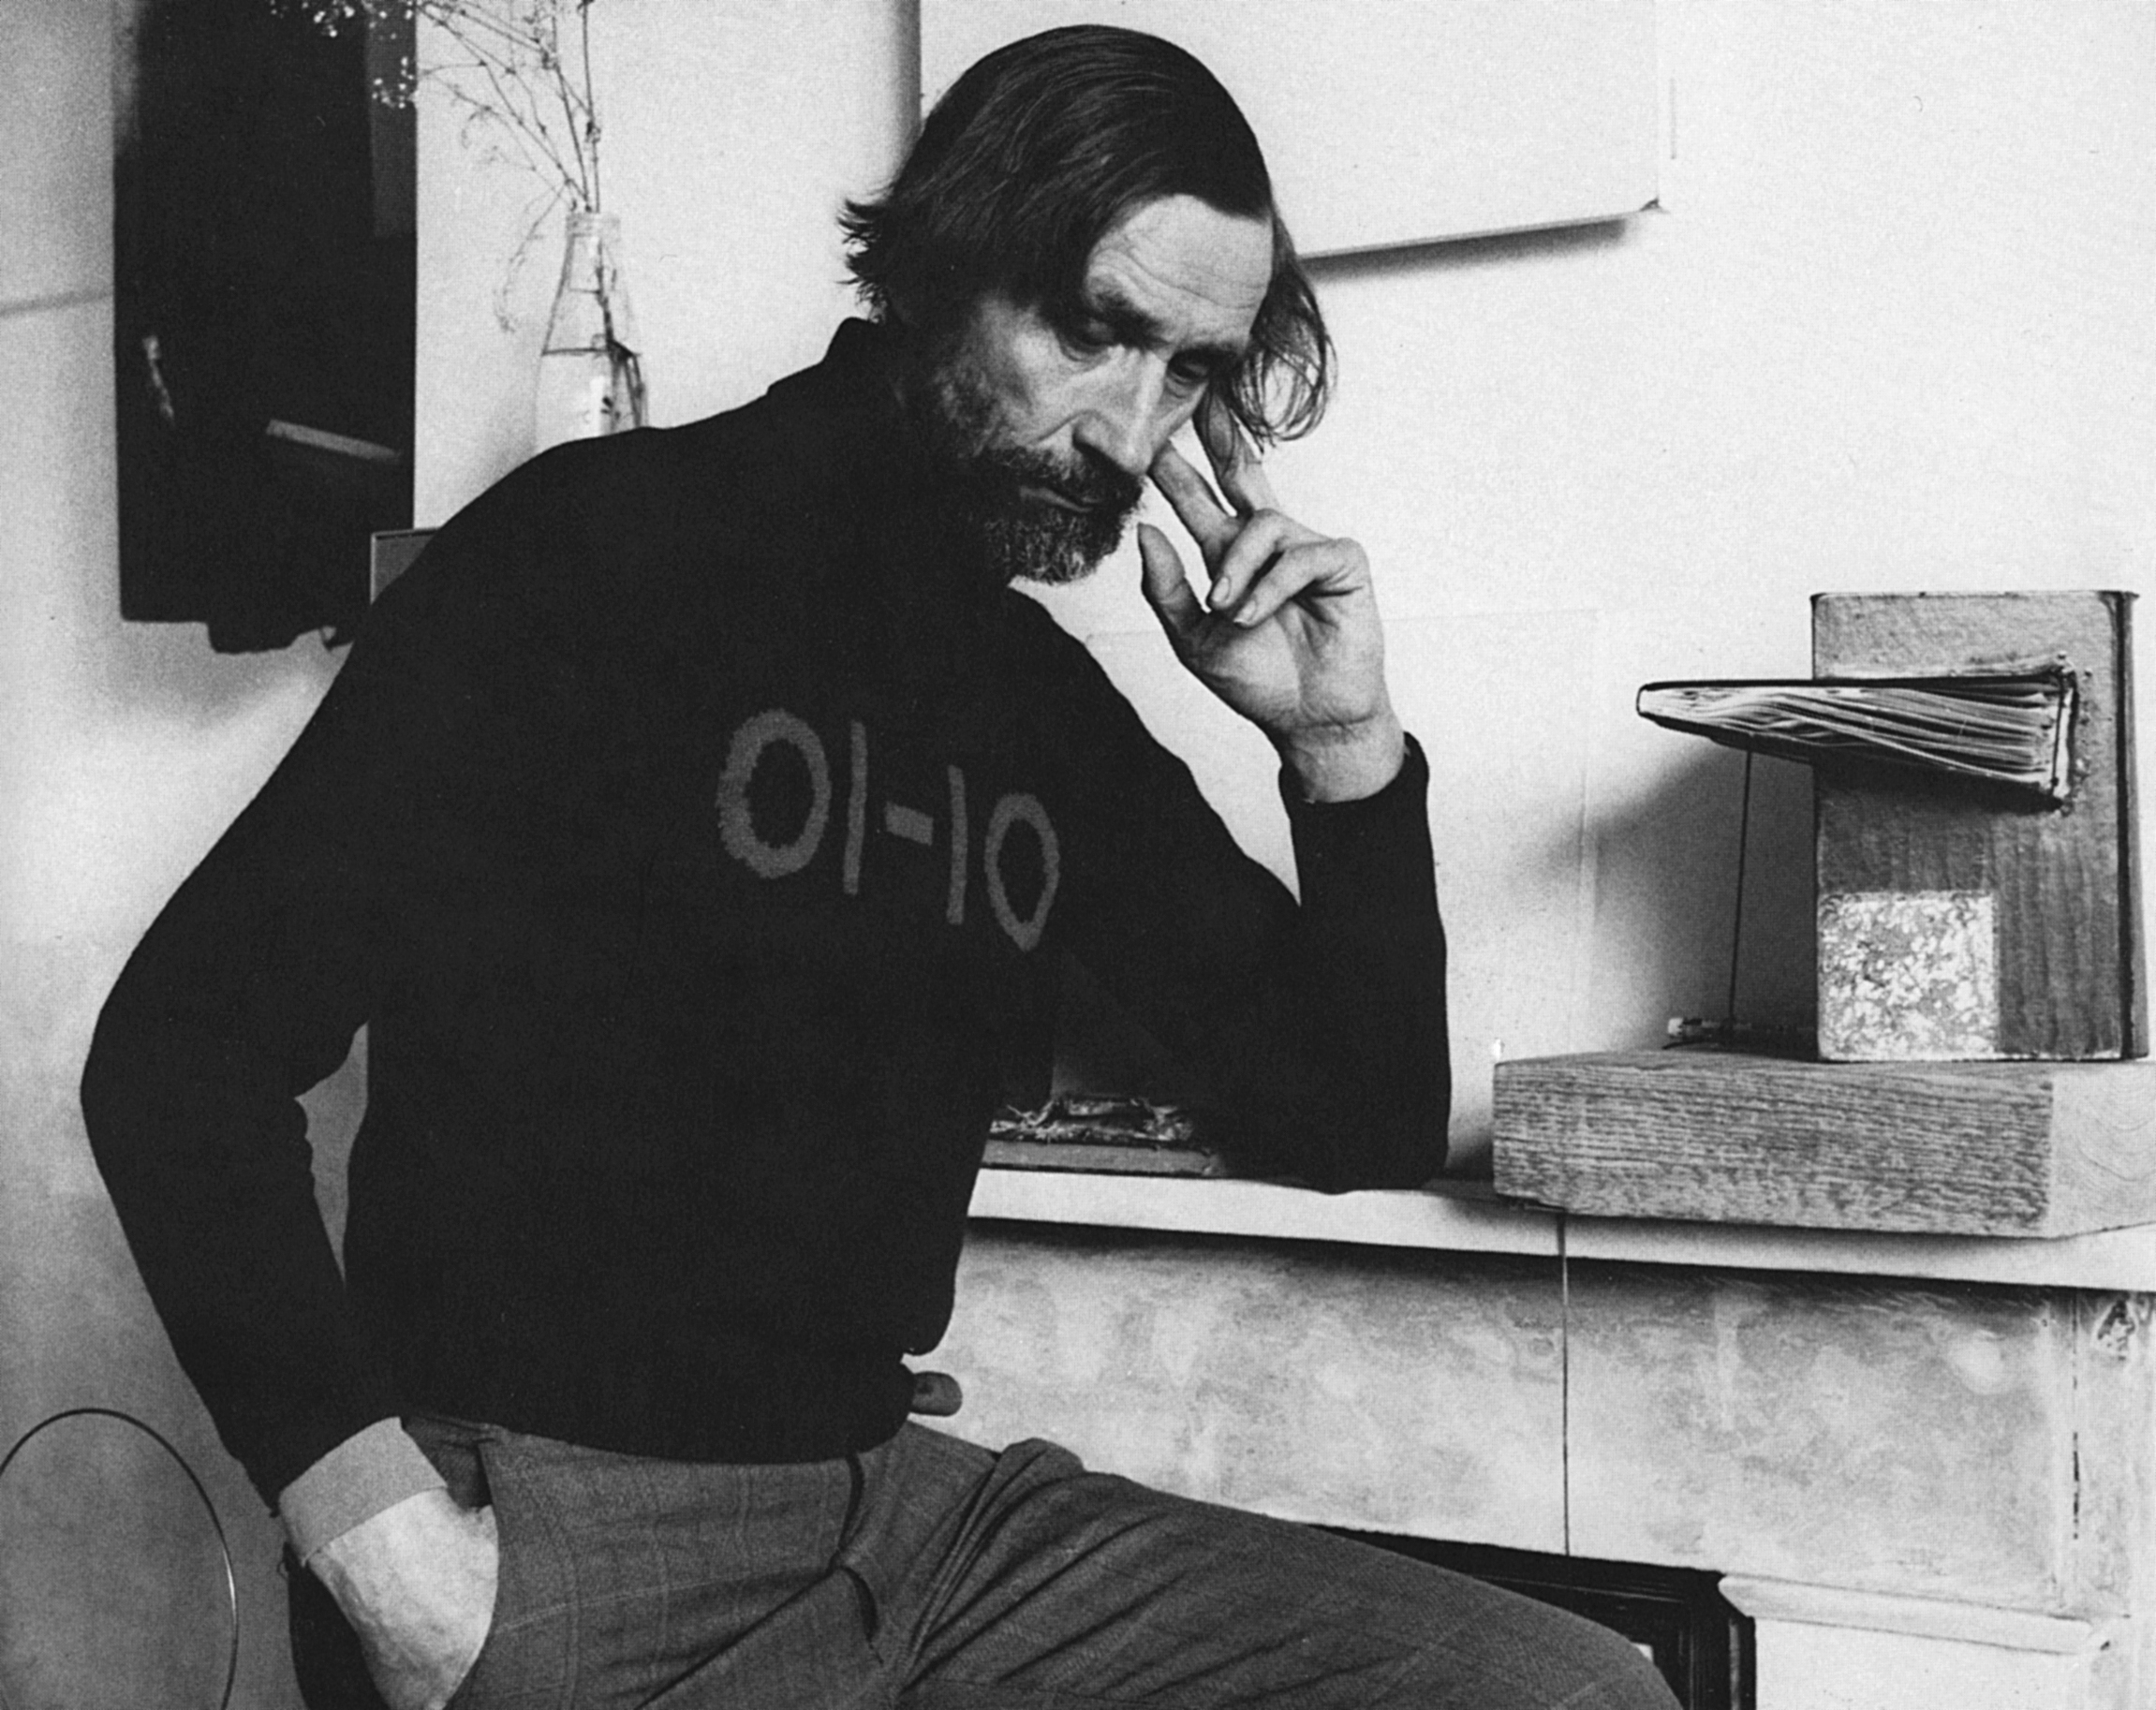 jlatham-pic-walia-courtesy-contemporary-british-artists-bergstroboyle-books-london-1979.jpg